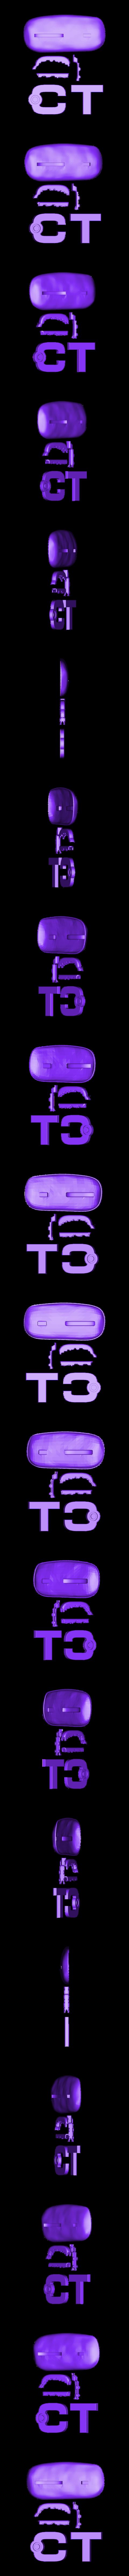 CreativeTools.se_-_ZPrinter-model_-_CT_logo.stl Download free STL file 3D text with snow • 3D printing design, CreativeTools